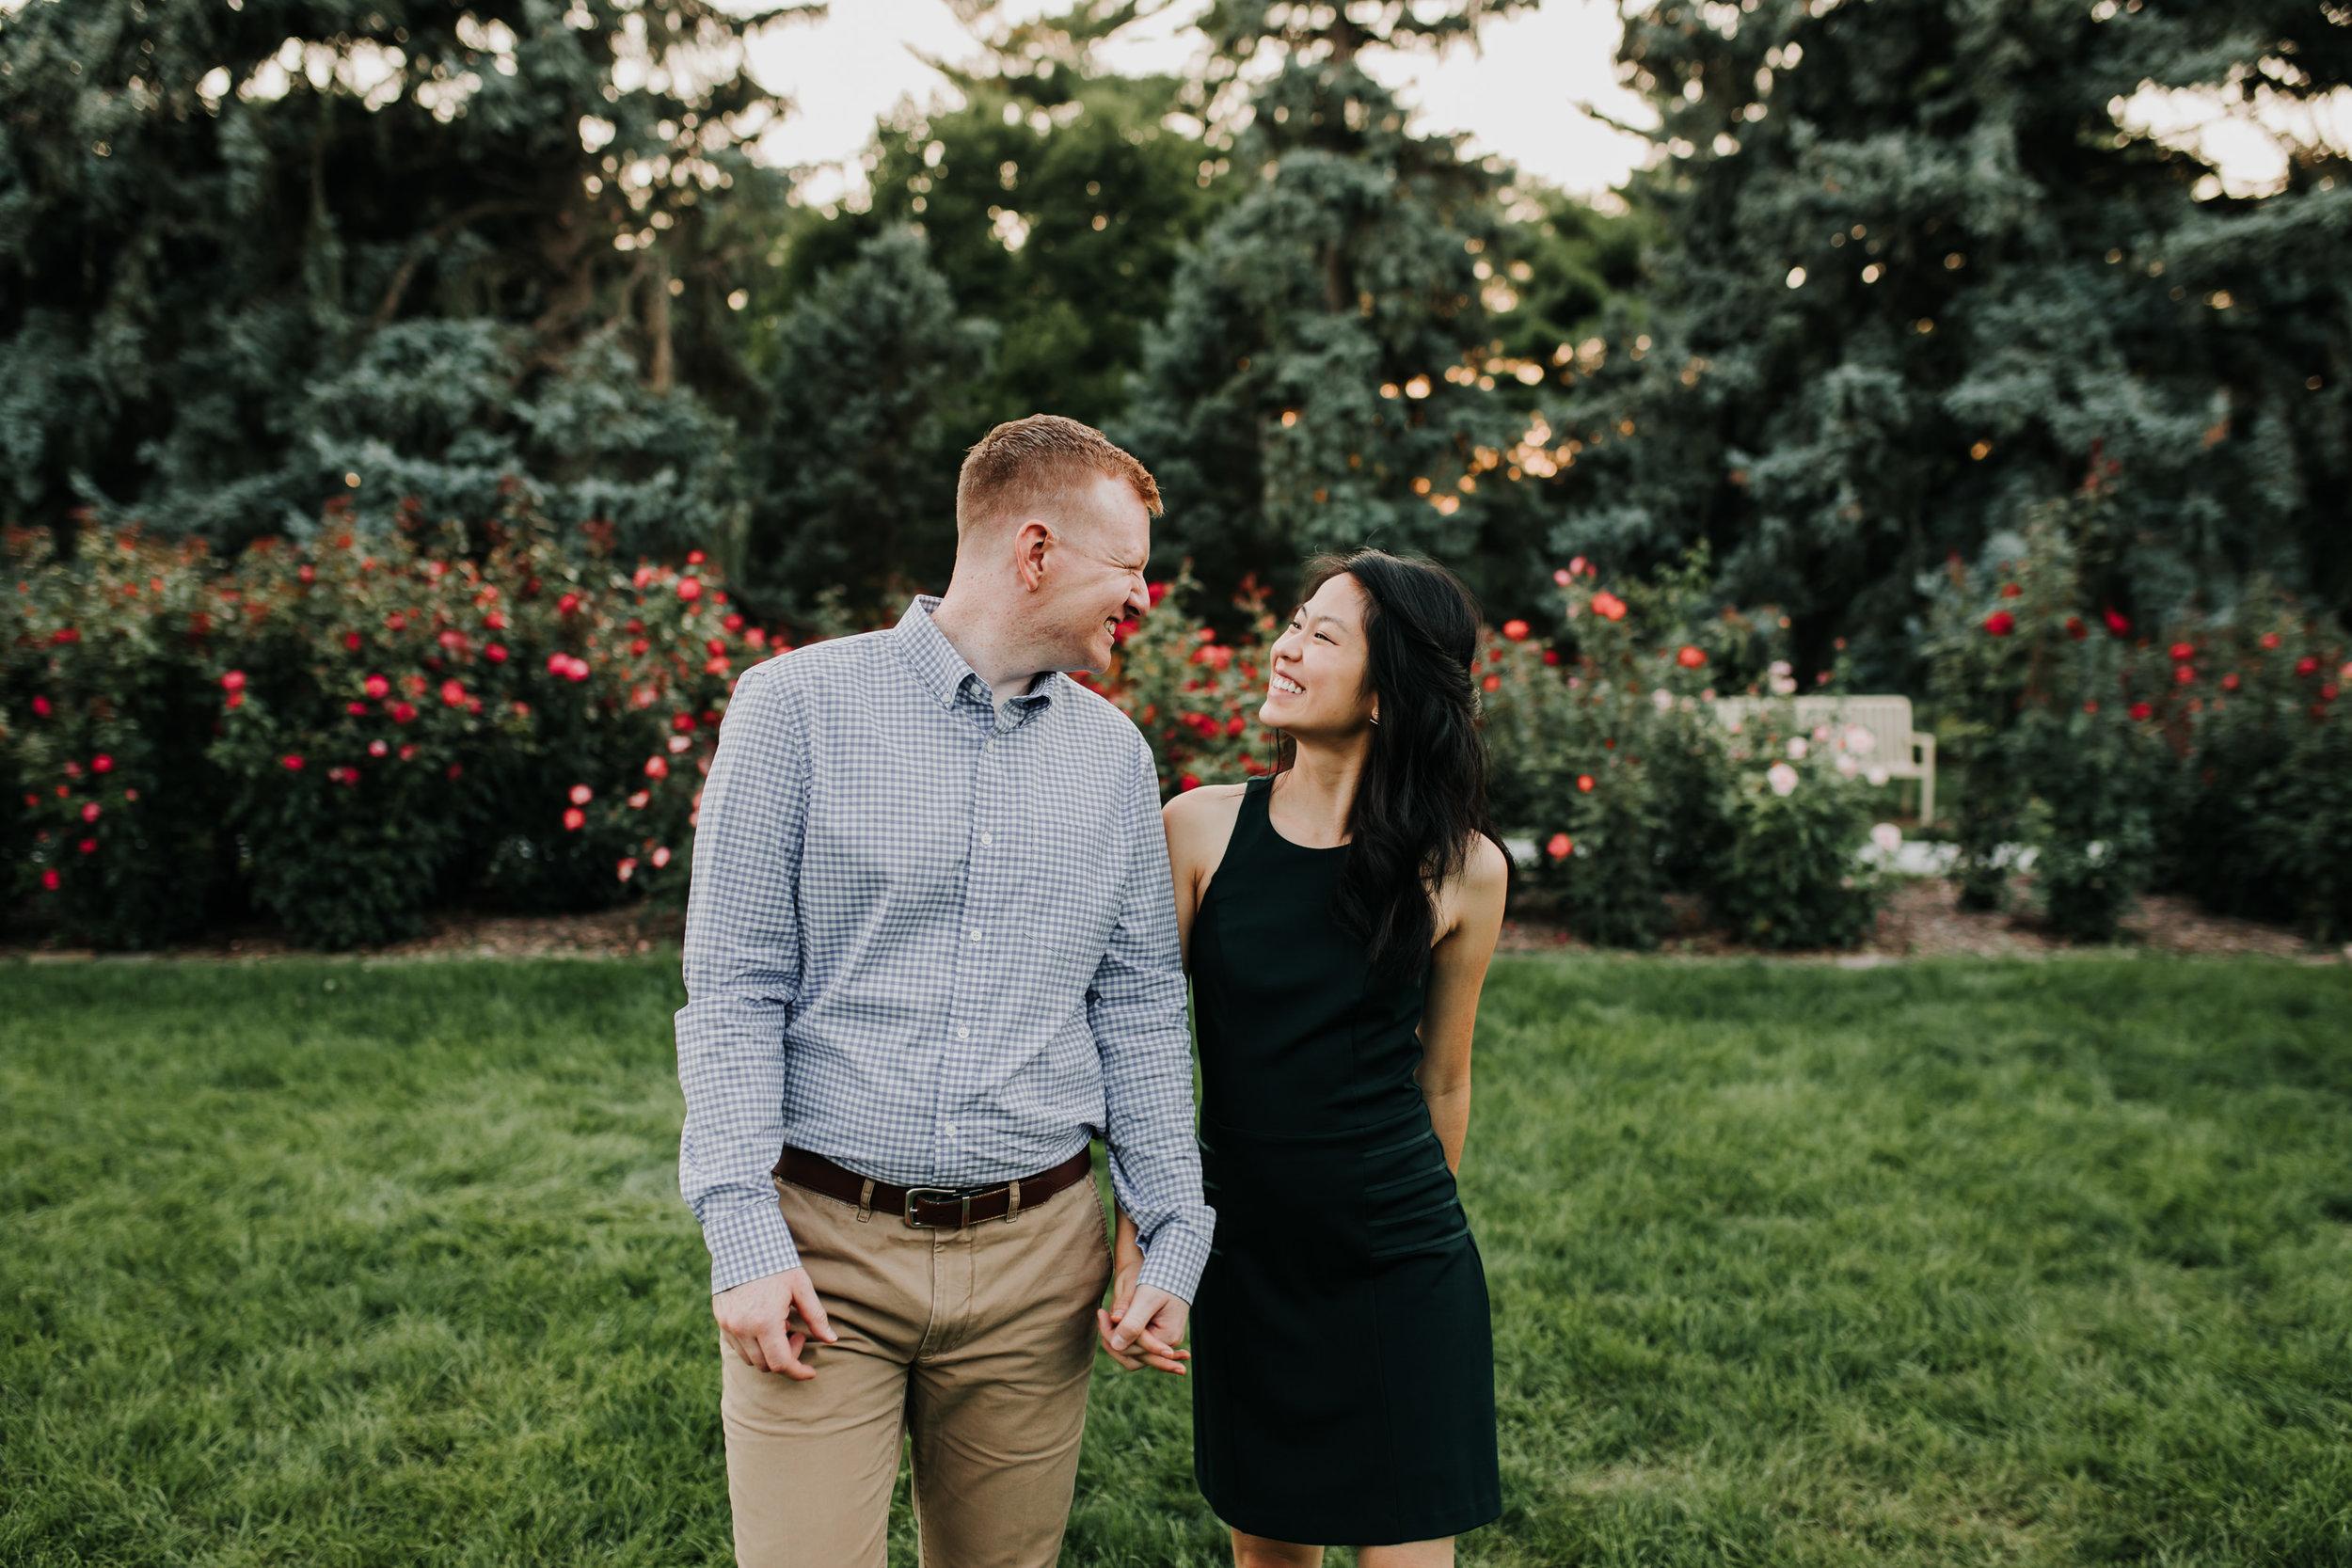 Catherin & Kyle - Married - Nathaniel Jensen Photography - Omaha Nebraska Wedding Photograper - Memorial Park - Joslyn Castle Engagement Session-70.jpg